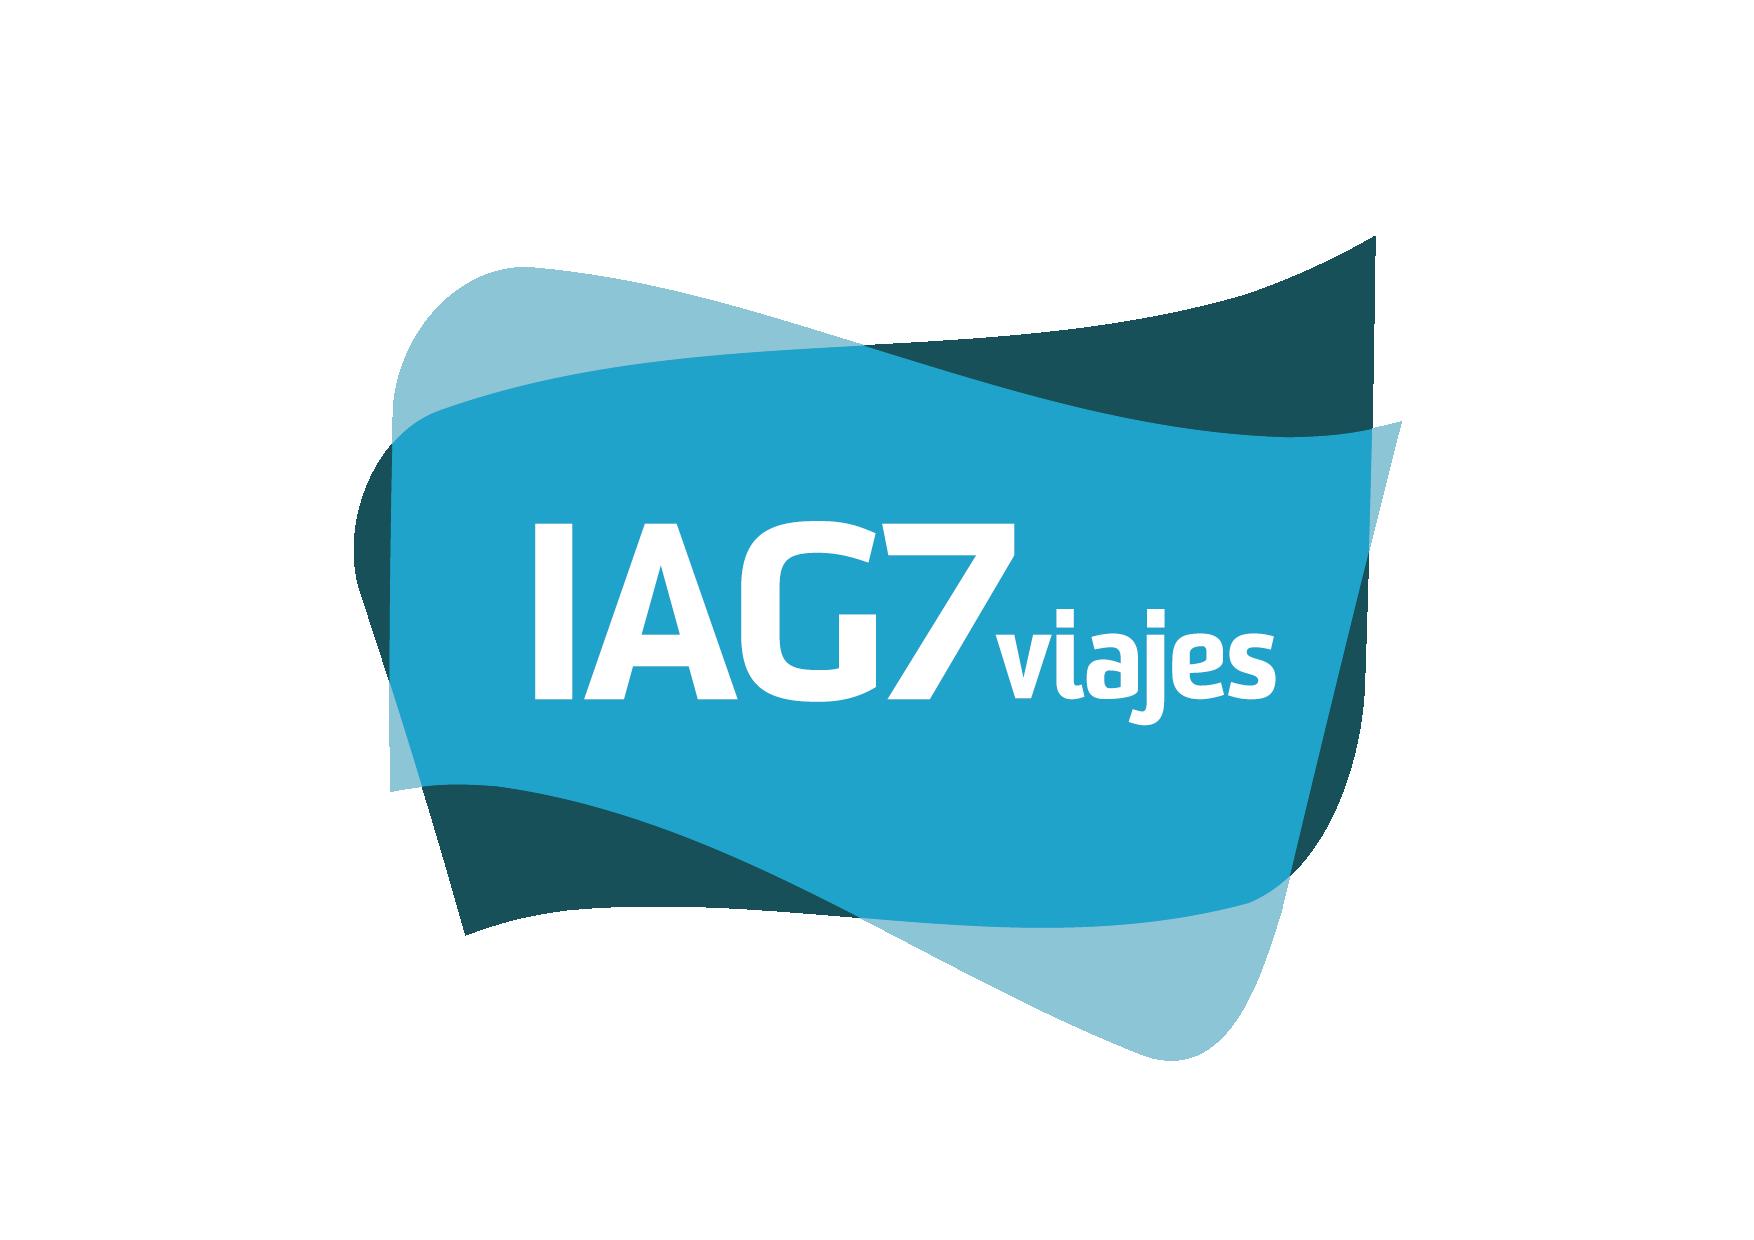 IAG7Viajes